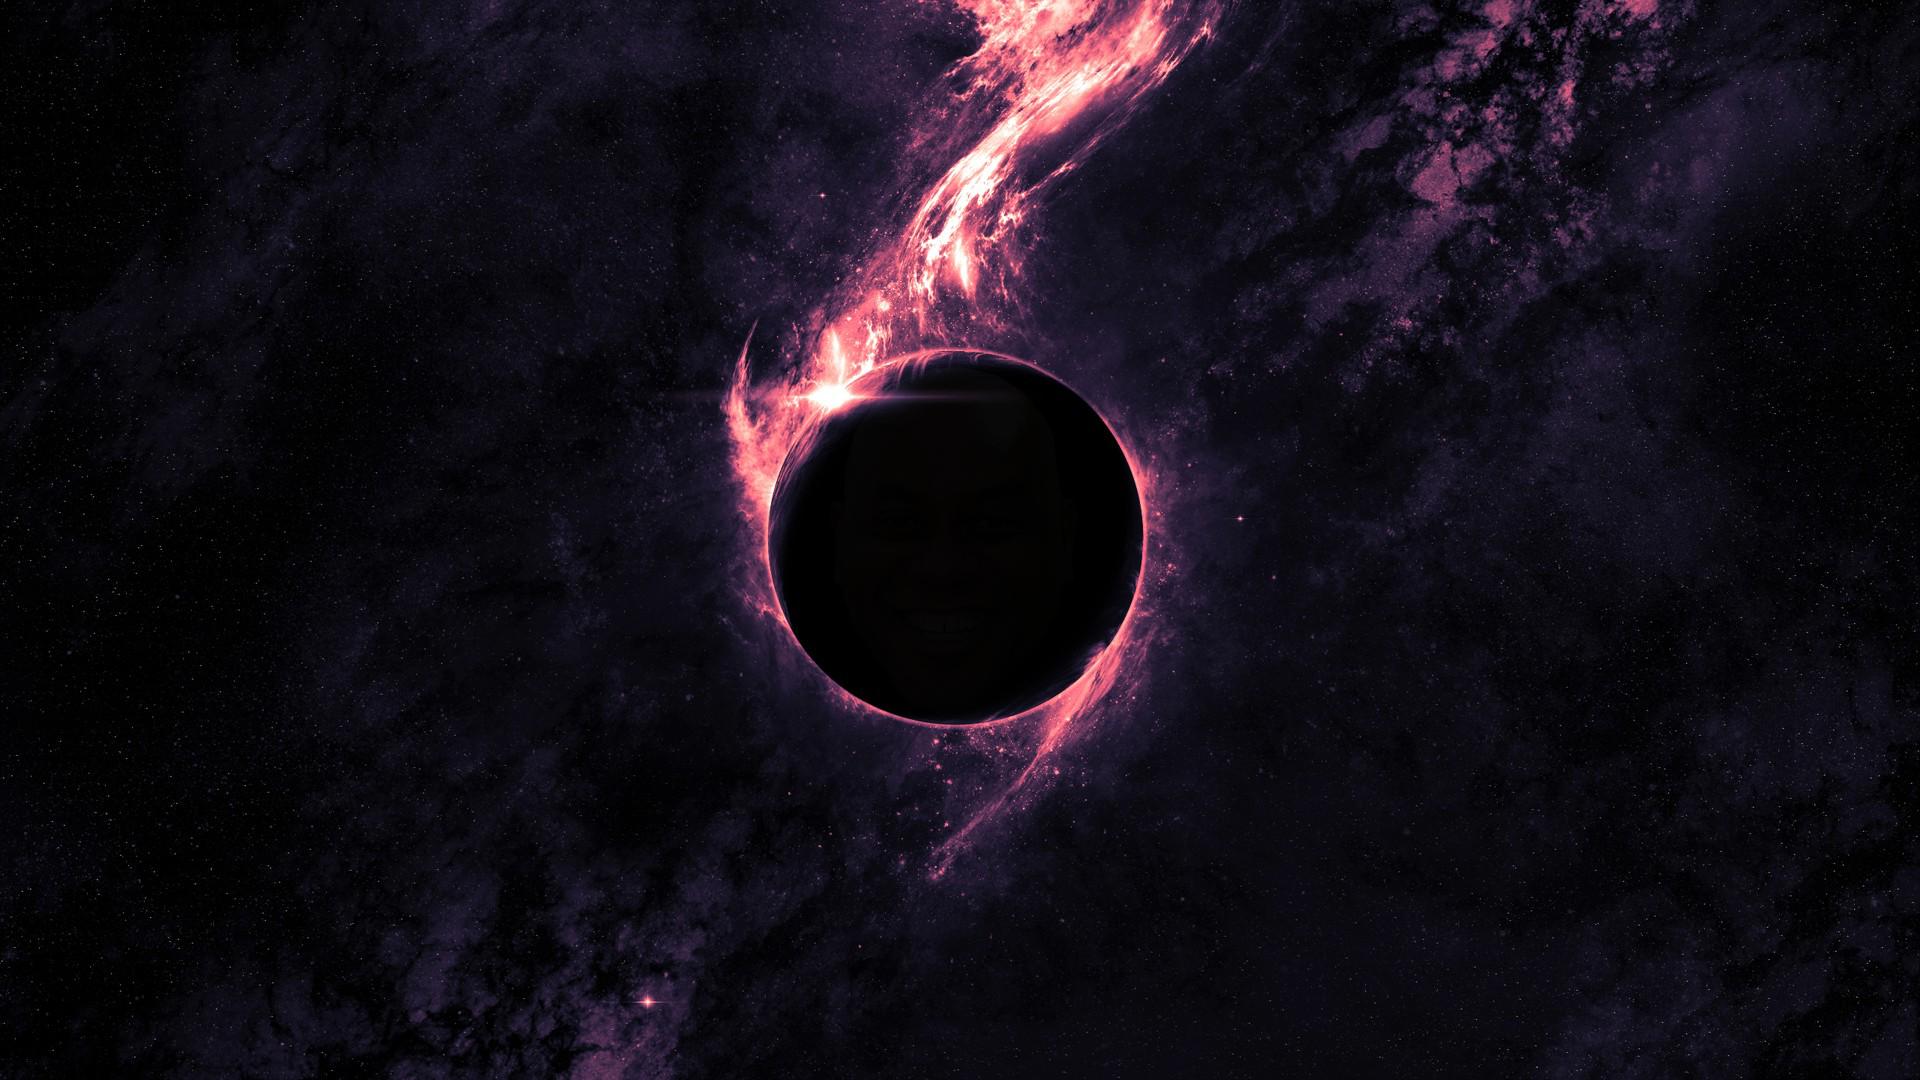 Void Wallpaper 1920x1080 Black Hole Wallpaper Dark Purple Wallpaper Black Hole